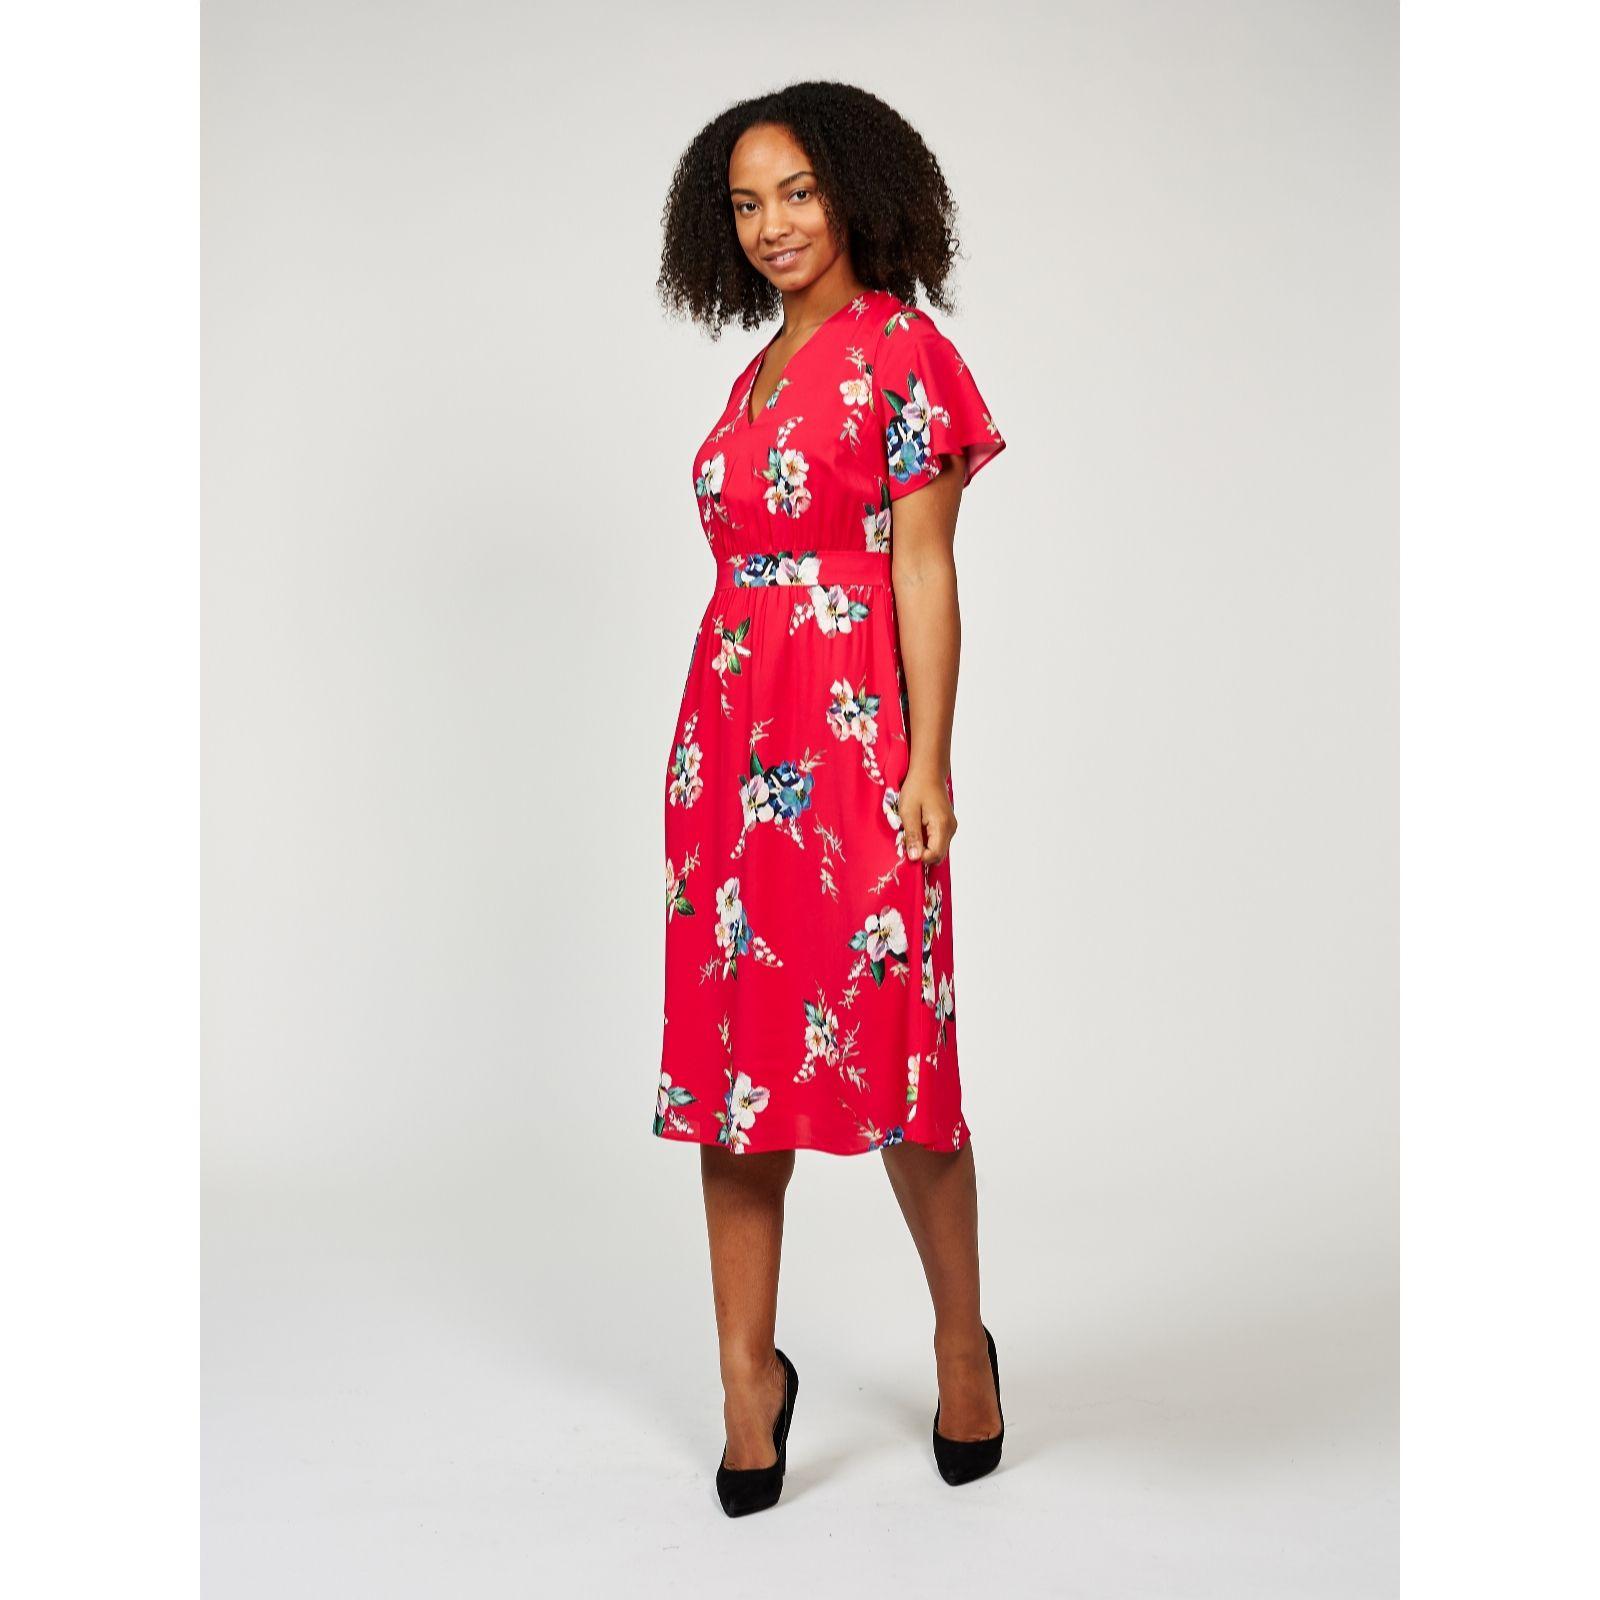 511a6cde5c3 Phase Eight Alexandra Floral Print Dress - QVC UK